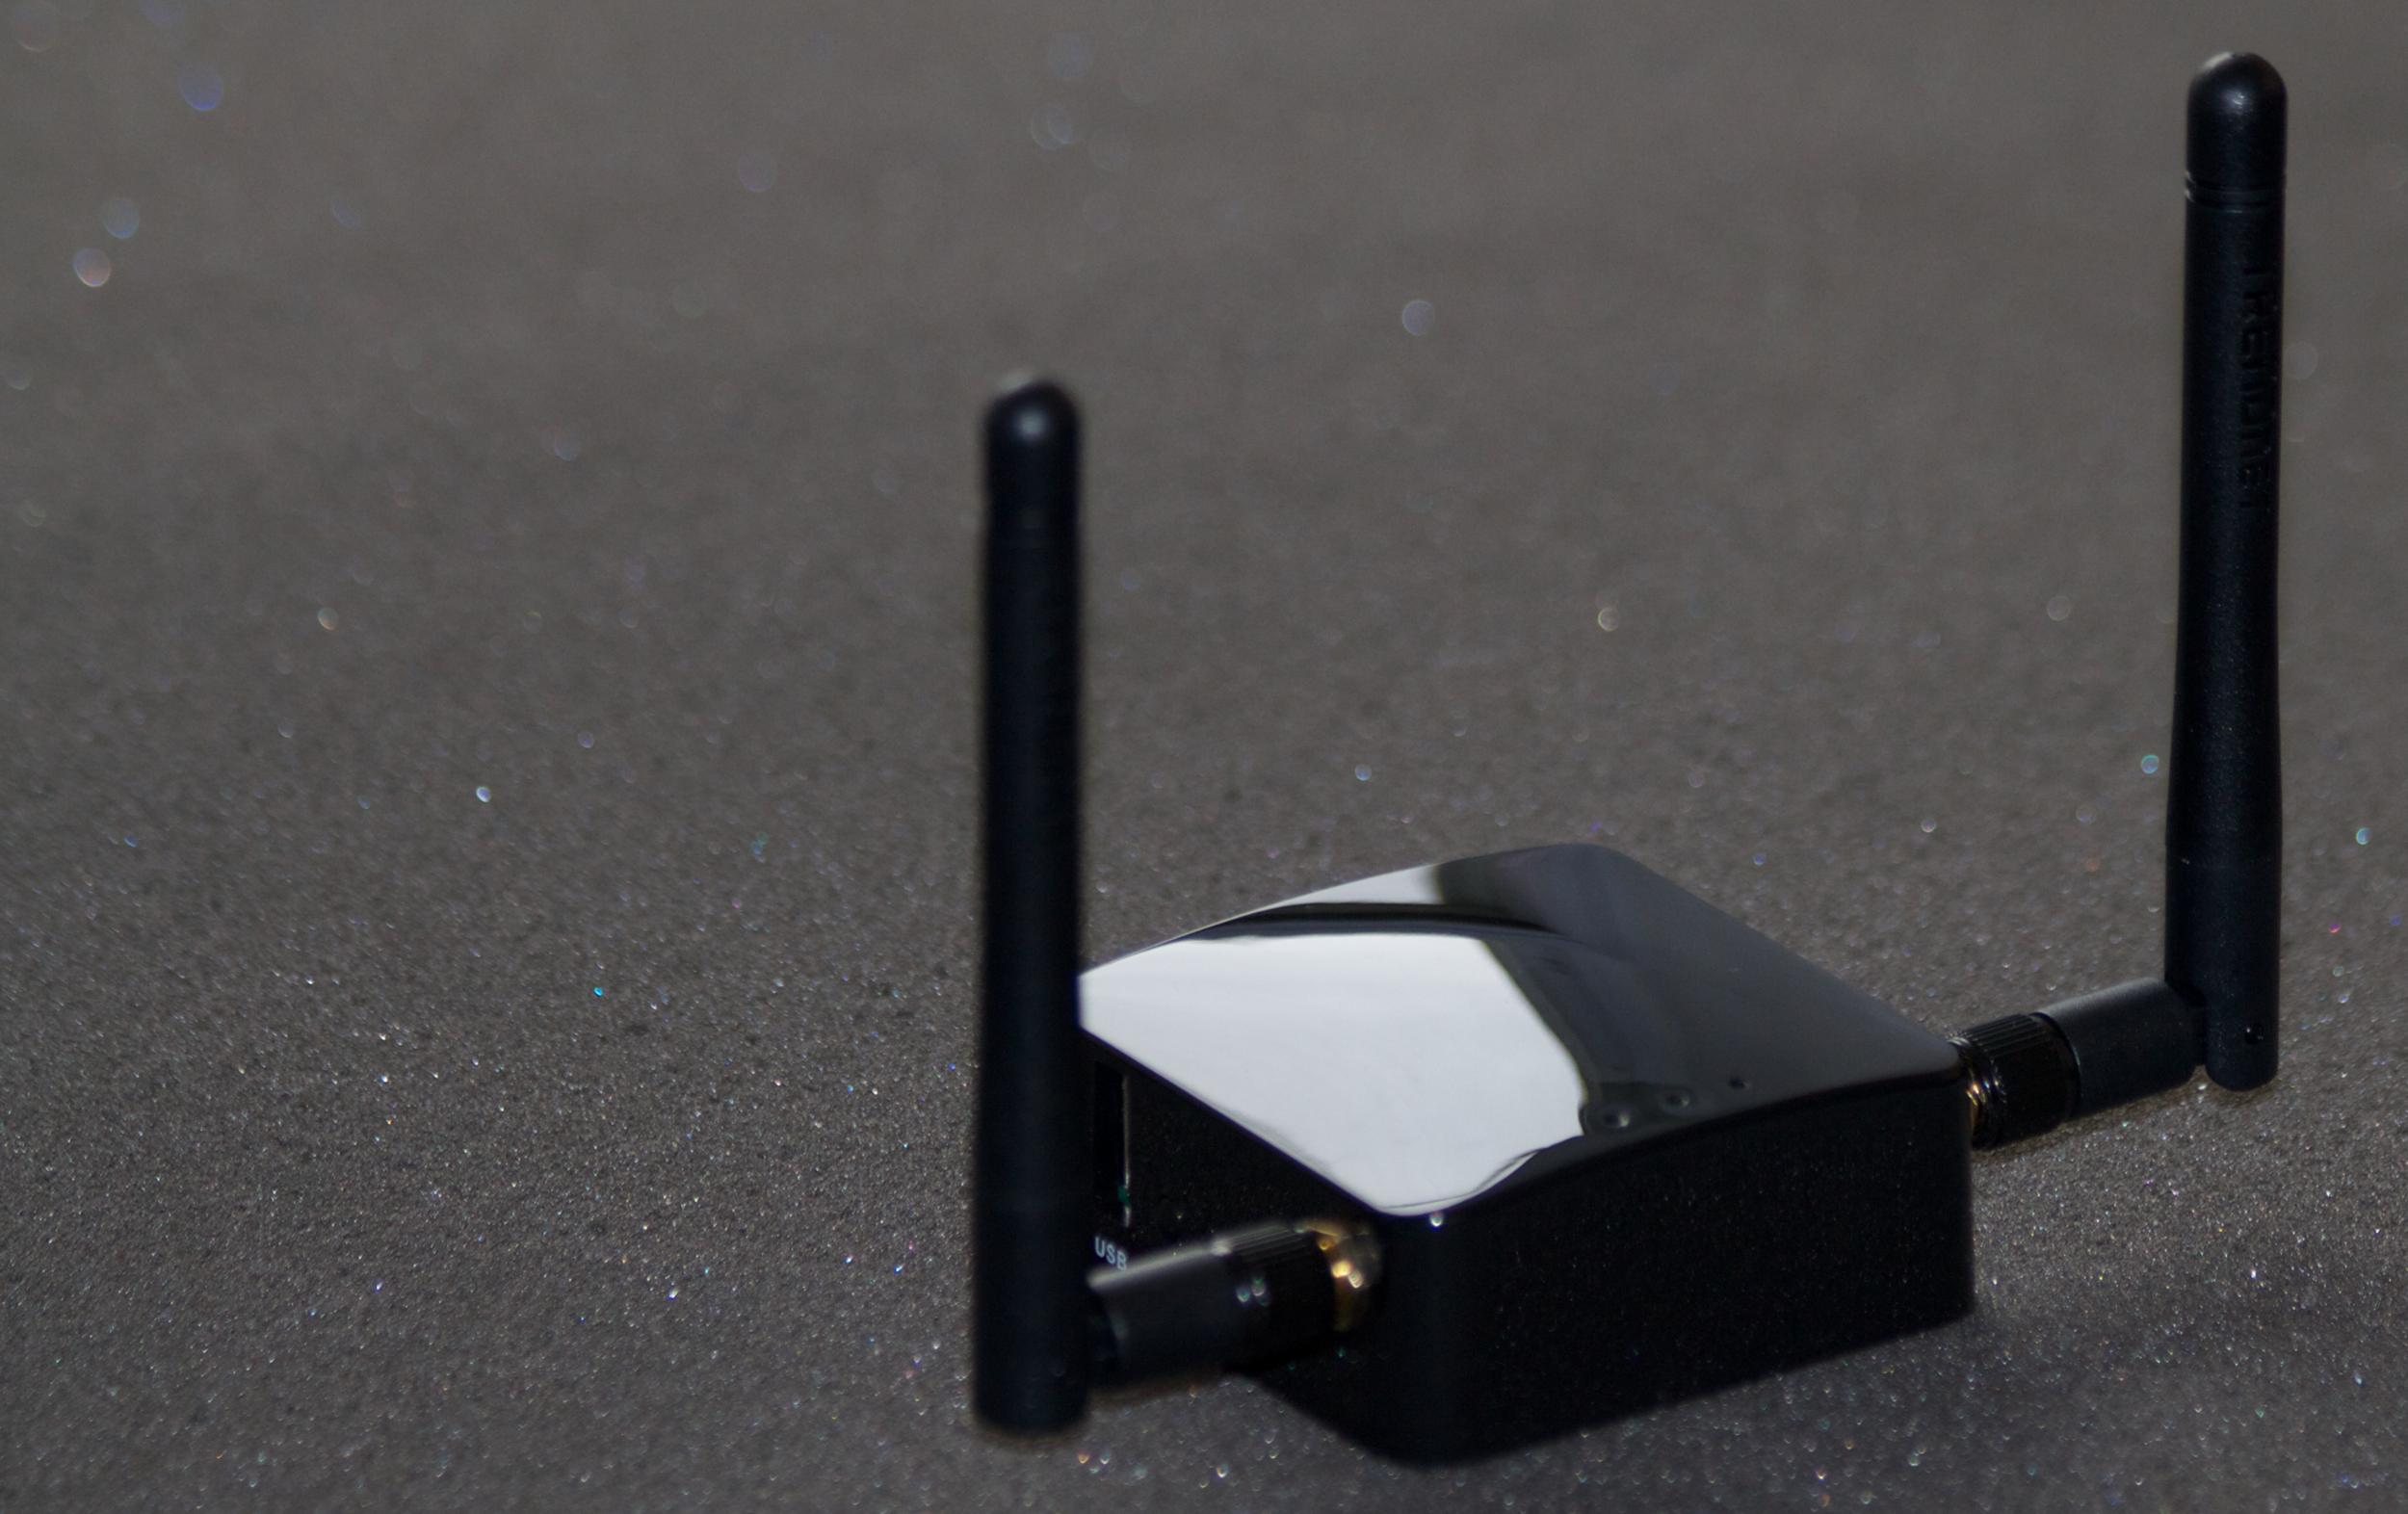 The Singularity with External Antennas